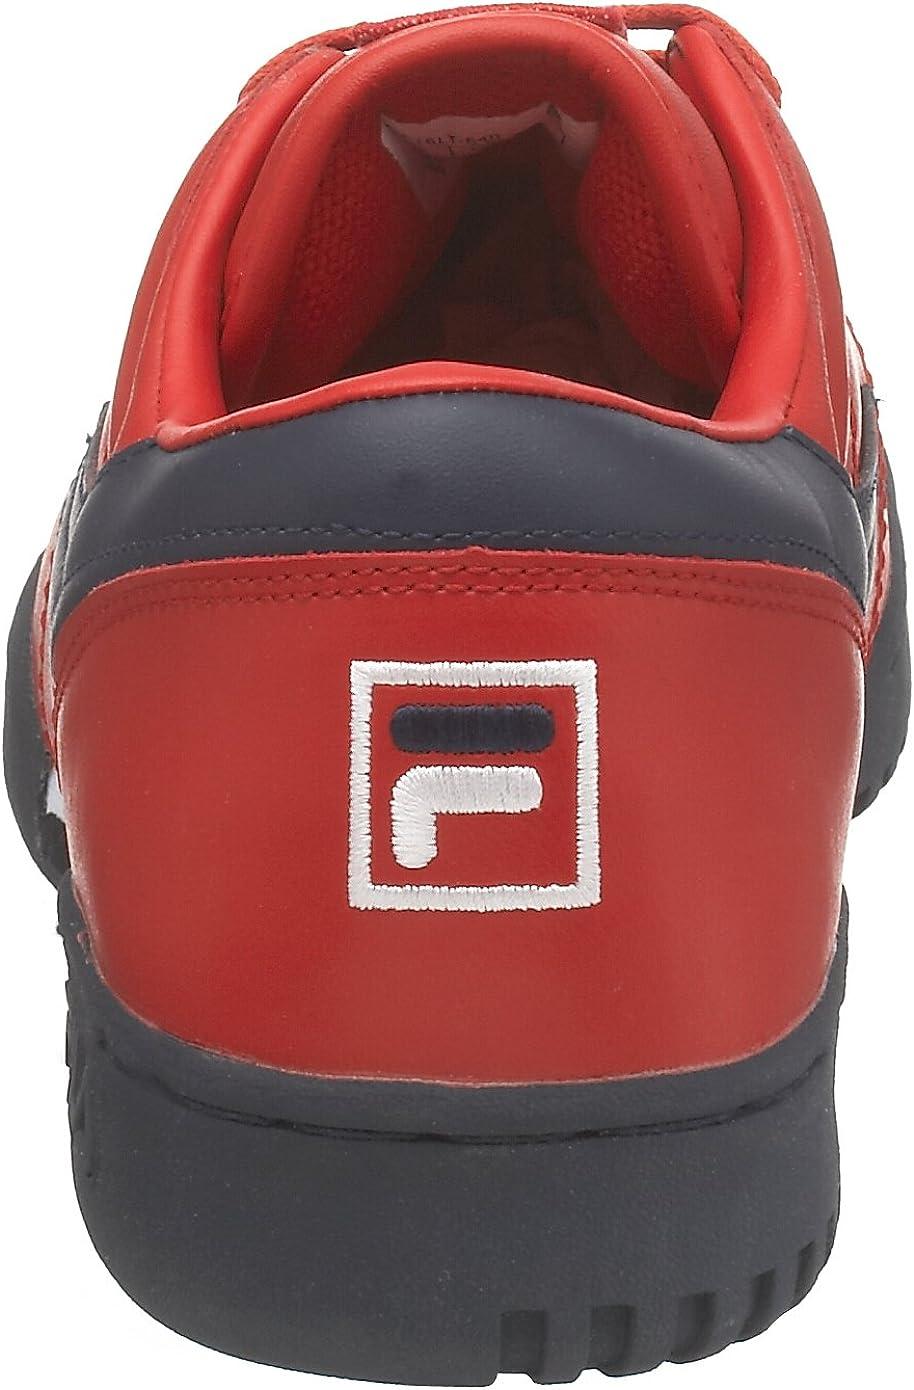 Fila Men's Original Fitness Lea Classic Sneaker Red/Navy/White